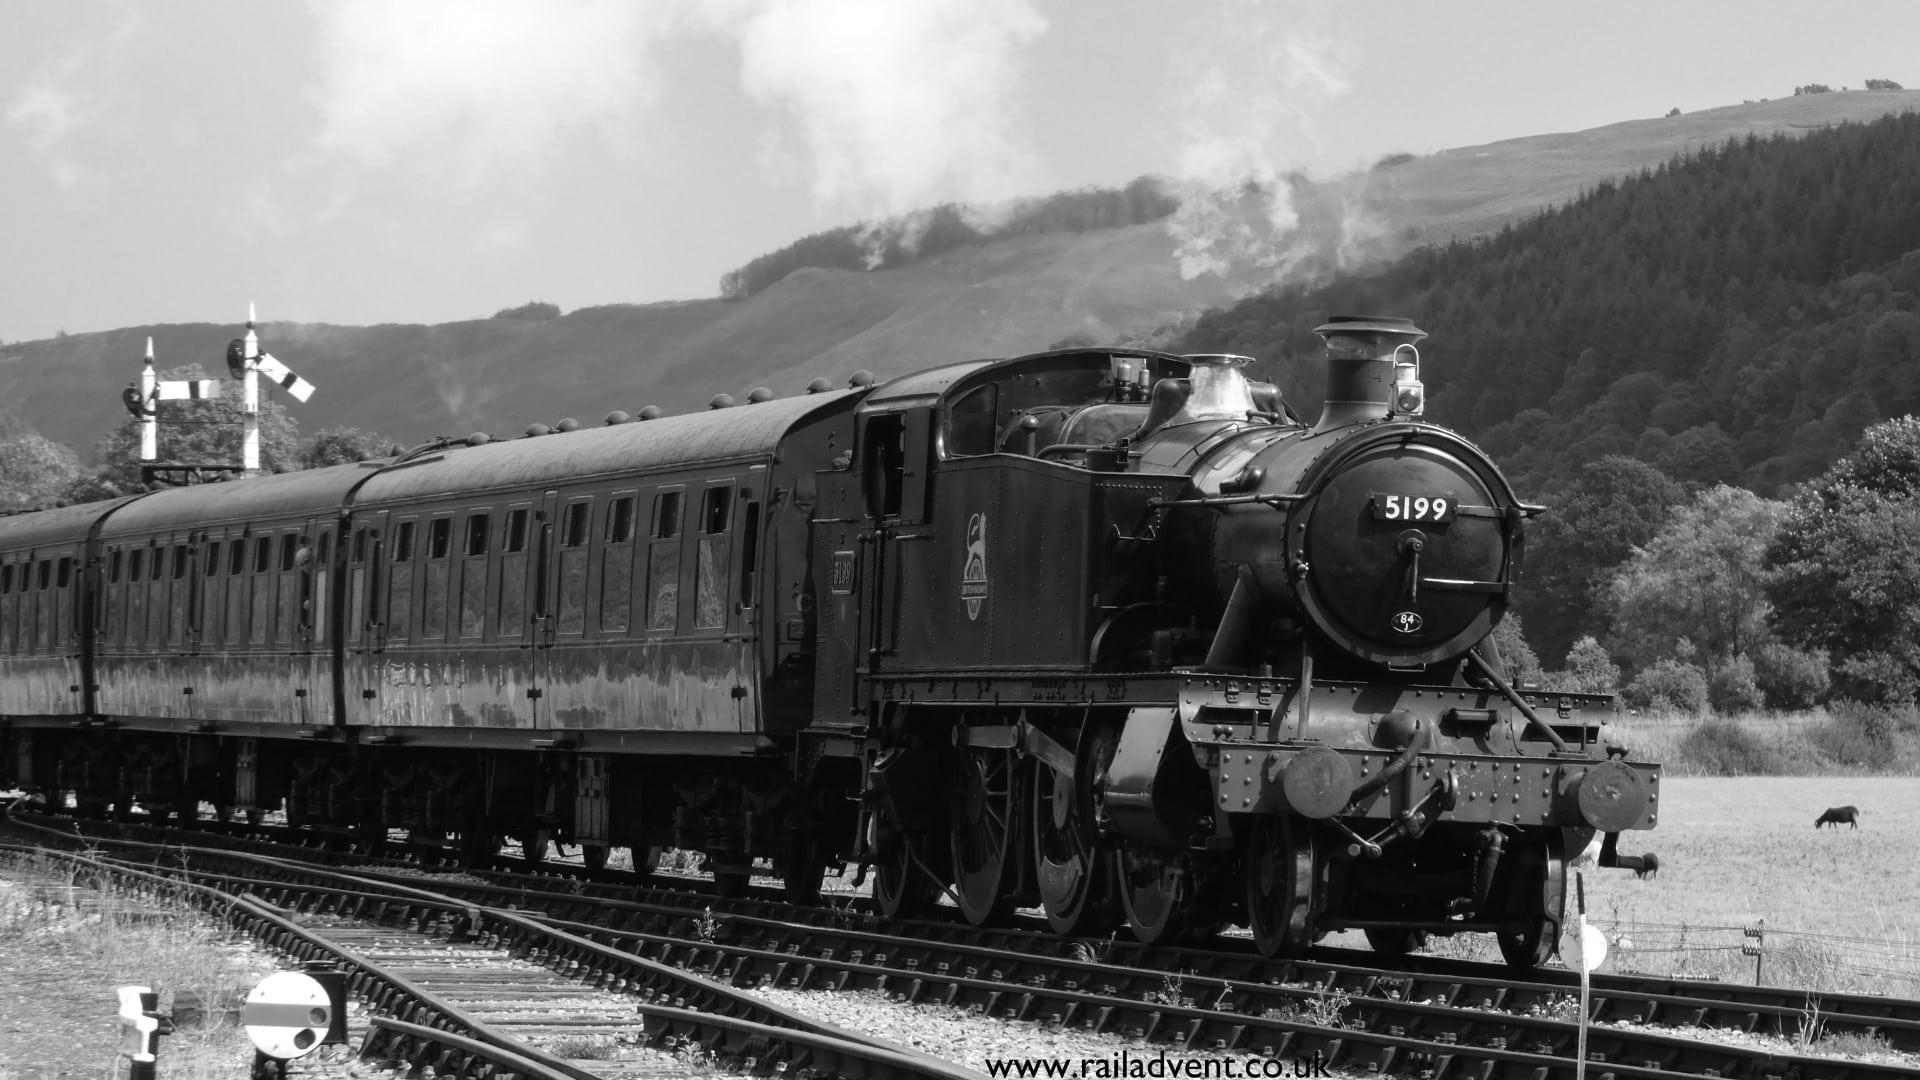 5199 arrives at Carrog on the Llangollen Railway